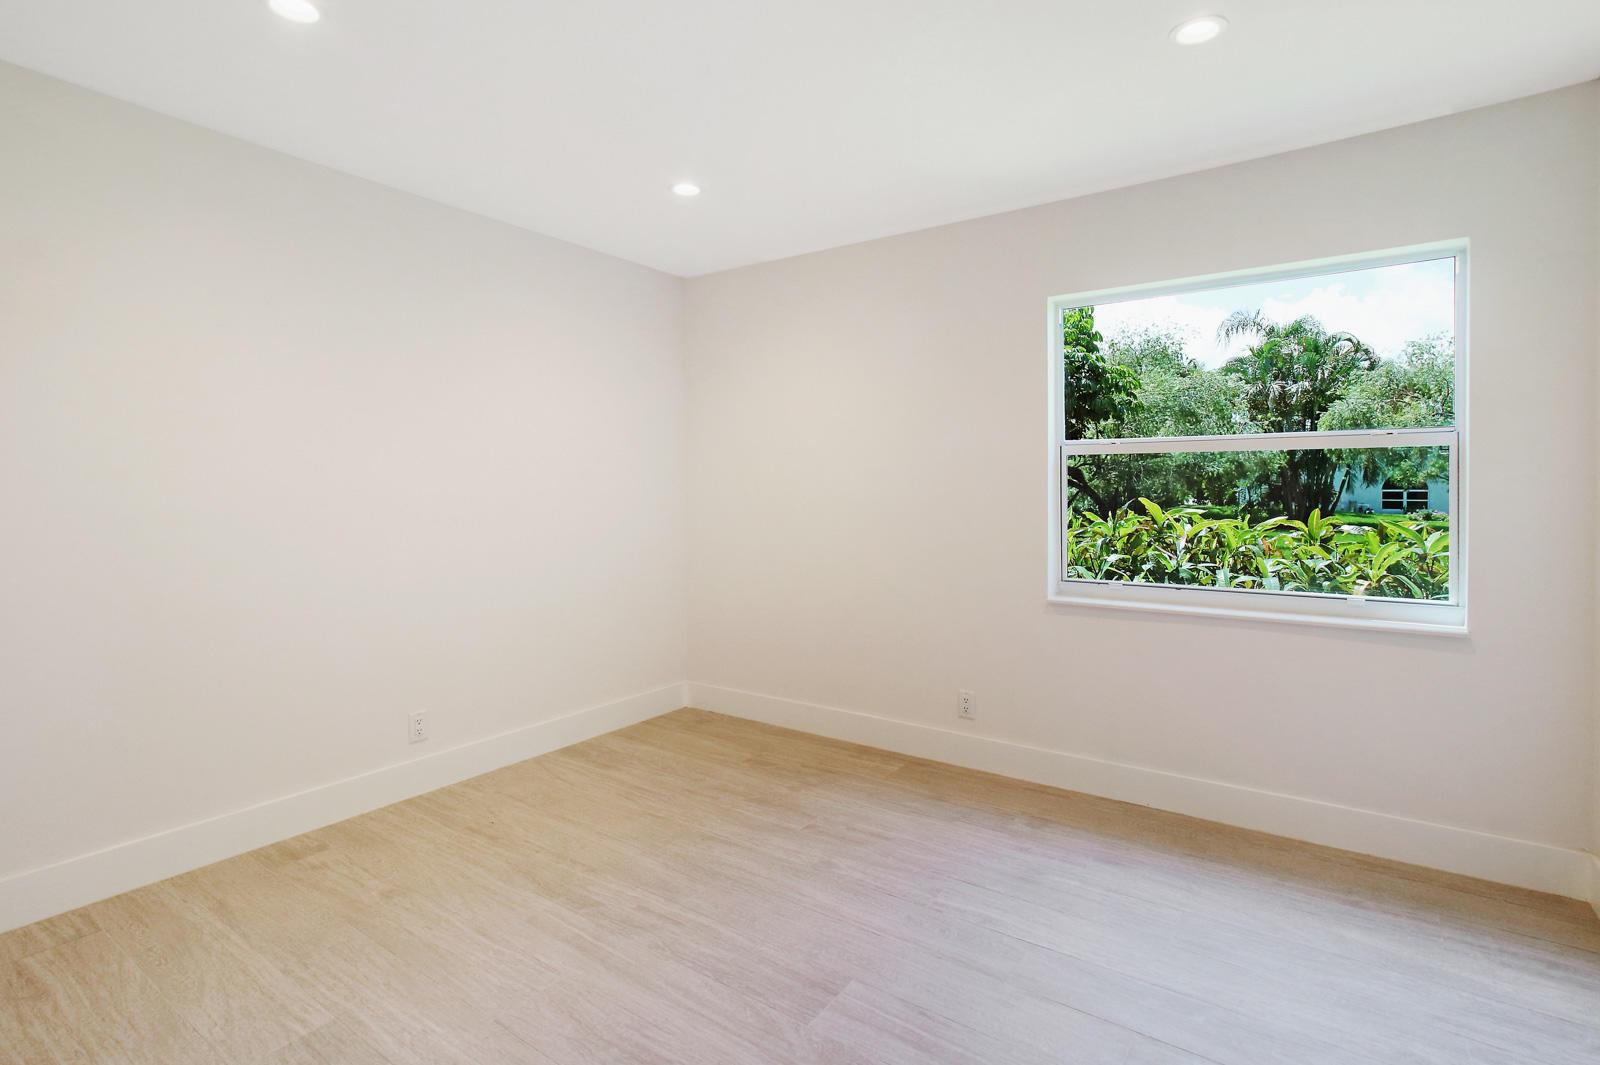 6451 Woodthrush Court, Palm Beach Gardens, Florida 33418, 3 Bedrooms Bedrooms, ,2.1 BathroomsBathrooms,A,Single family,Woodthrush,RX-10474815